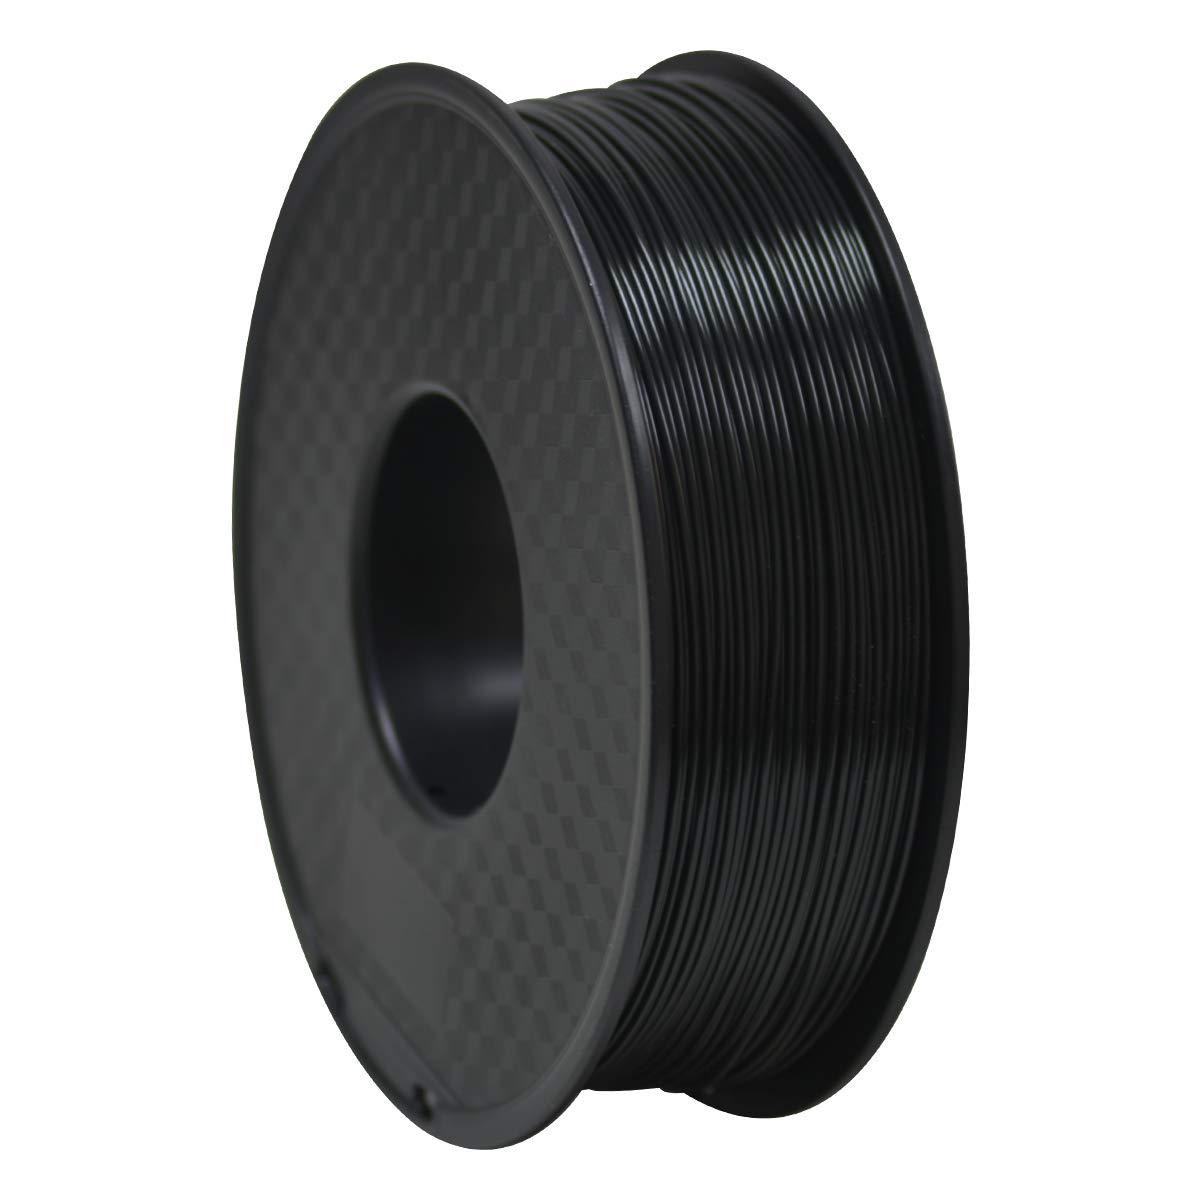 GEEETECH ABS Filamento 1.75mm Negro, Impresora 3d Filamento 1KG 1 ...